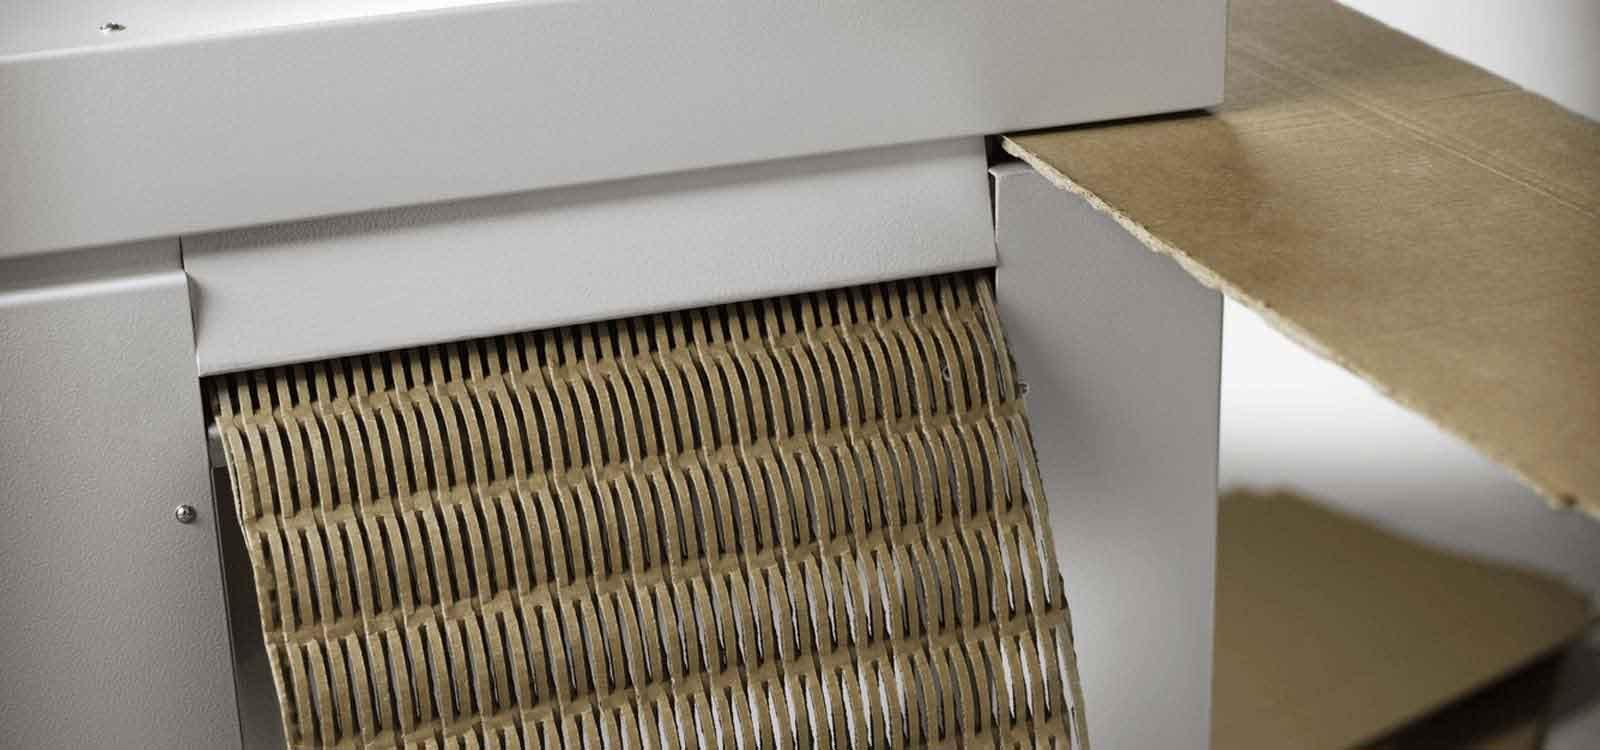 Kartonschredder-Header